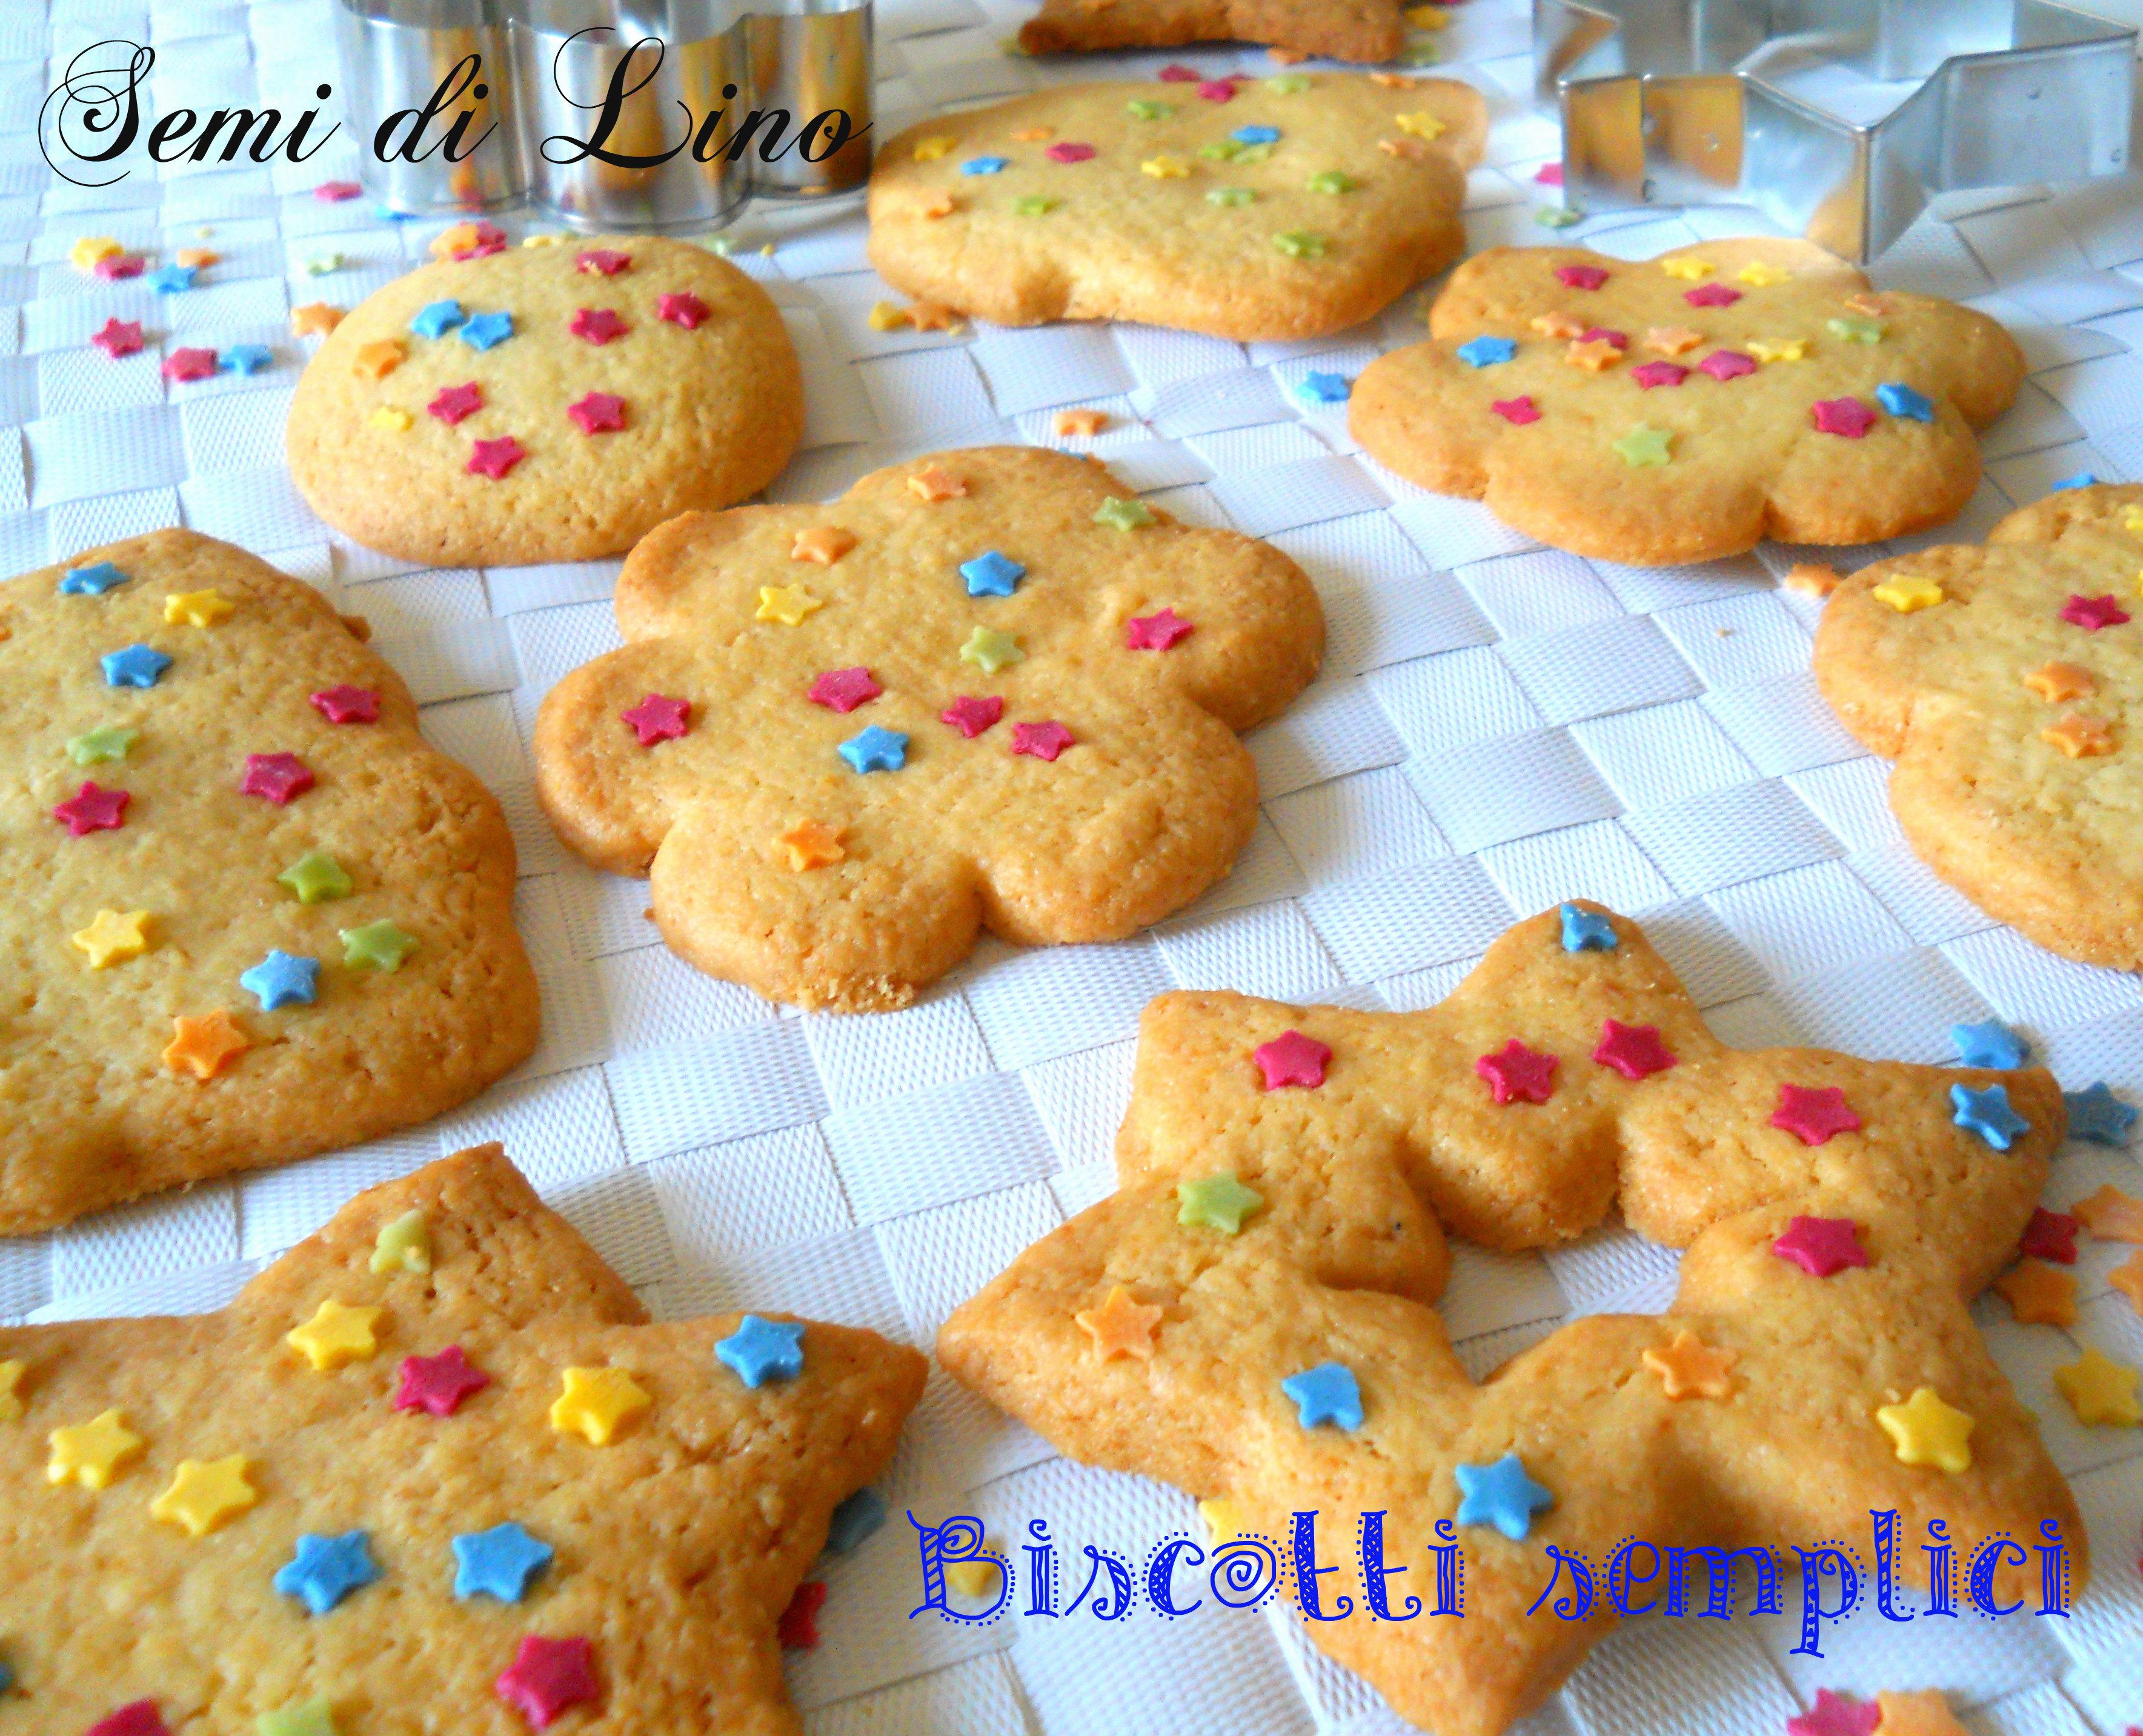 Ricetta Biscotti Semplici.Biscotti Semplici Ricetta Biscotti Il Blog Di Semi Di Lino